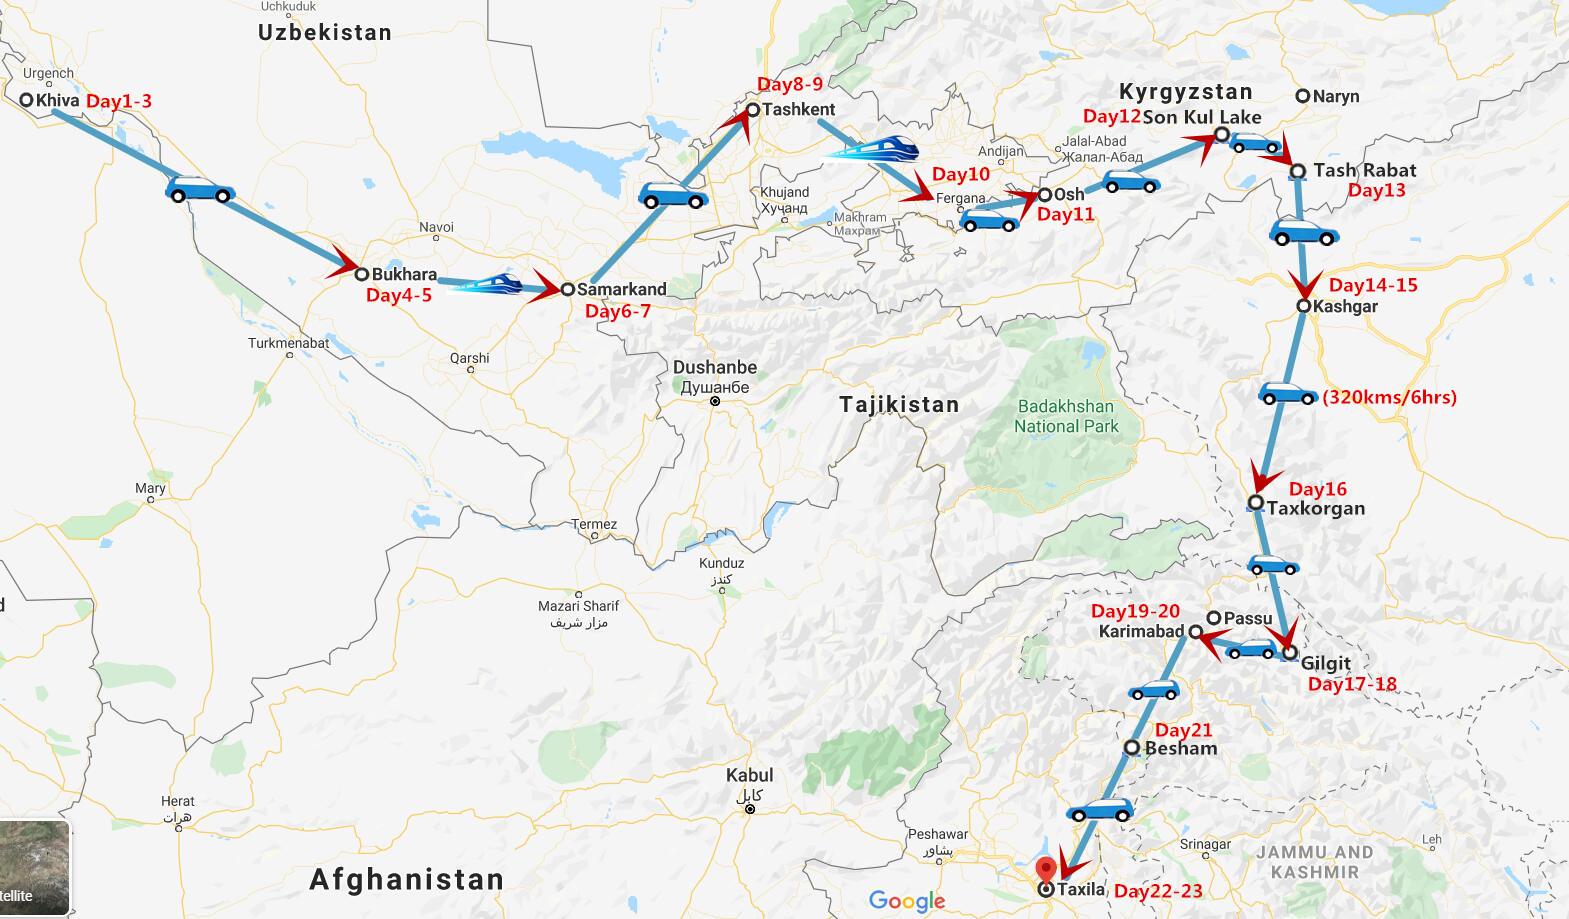 23 Days Uzbekistan to Pakistan via Karakoram Highway Travel Map